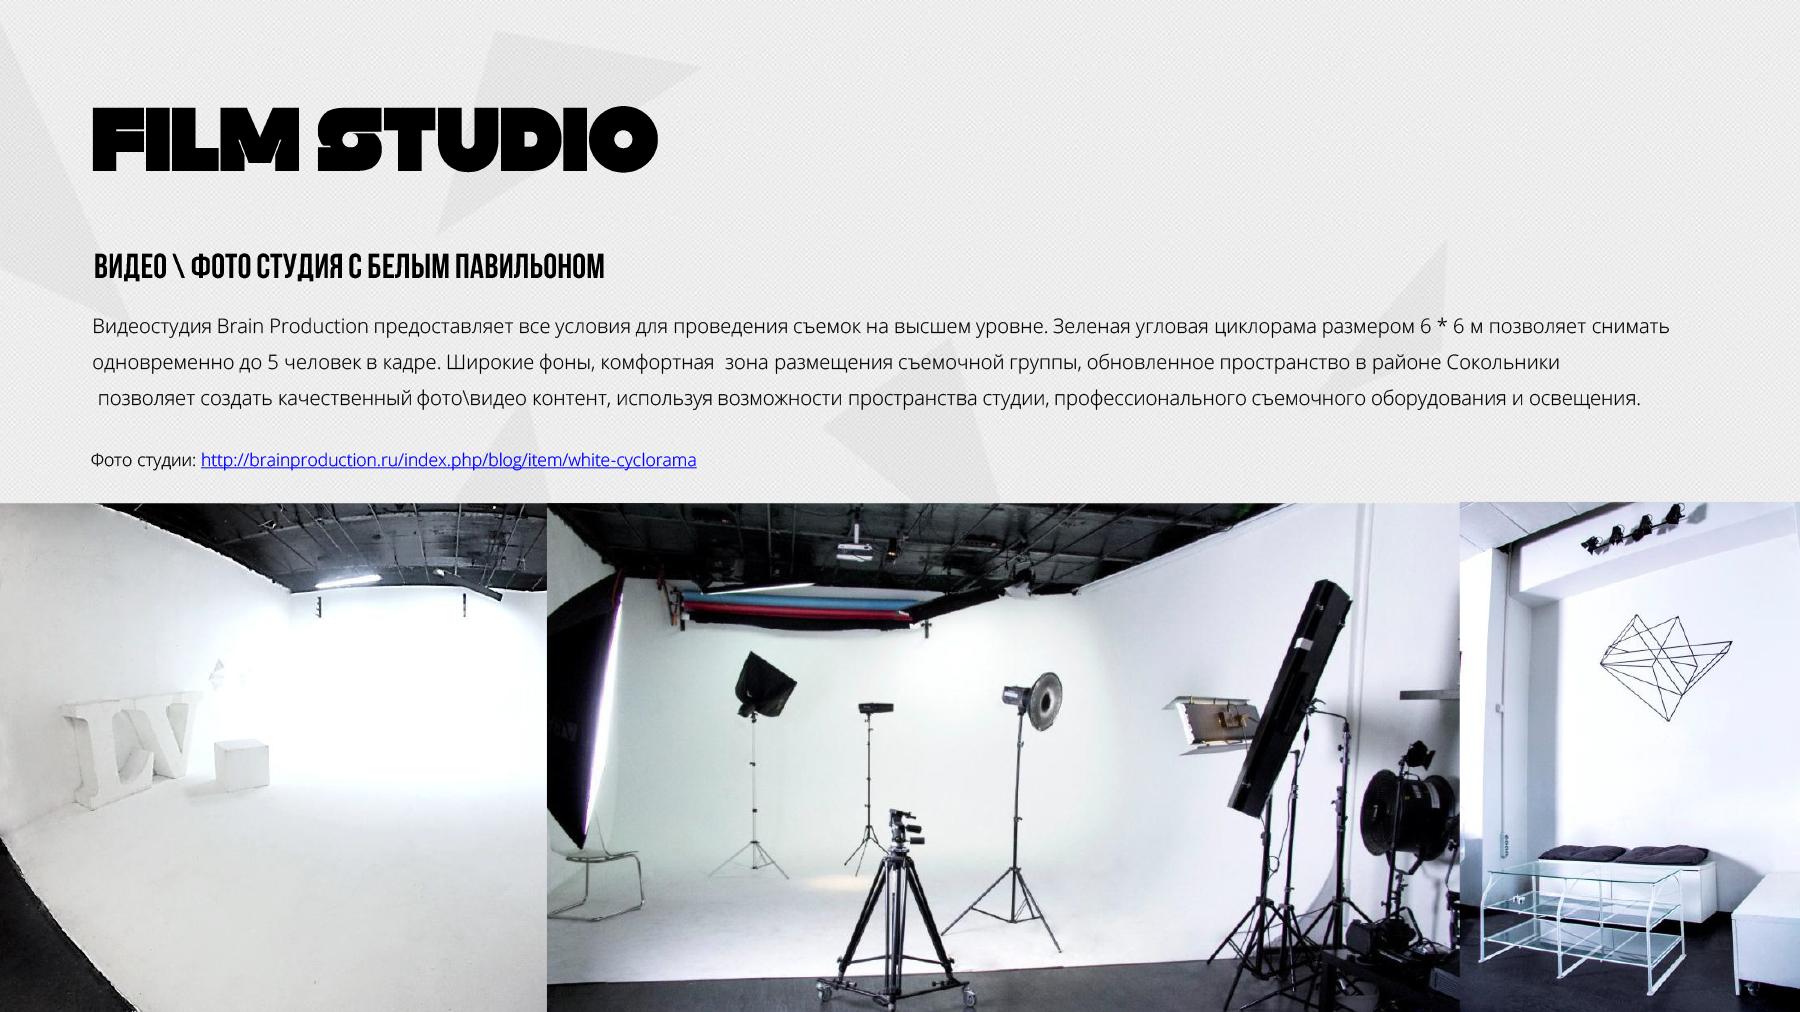 FILM_STUDIO-rent-cyclorama